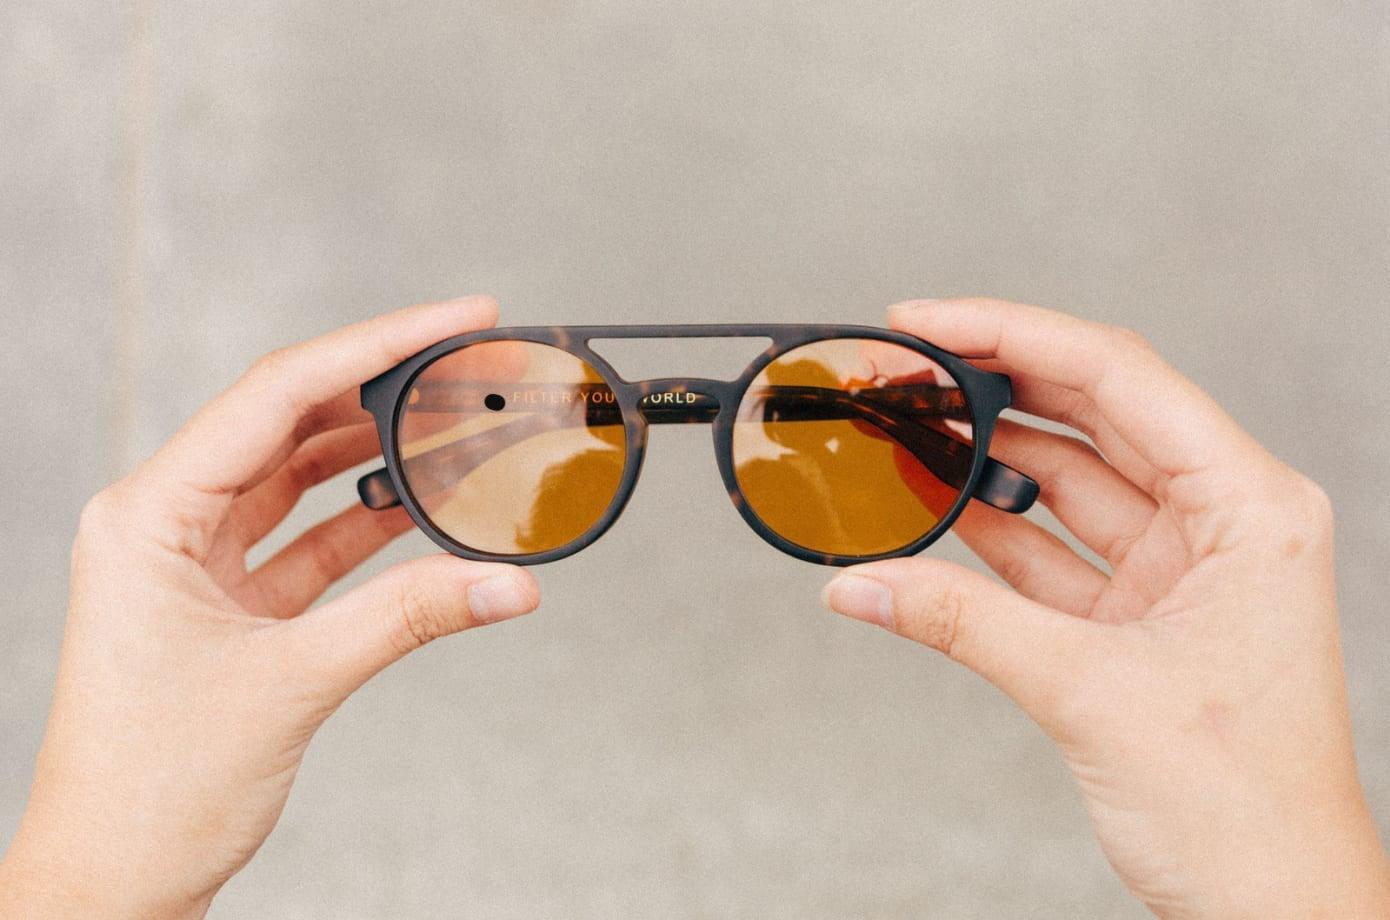 Spectachrome sunglasses